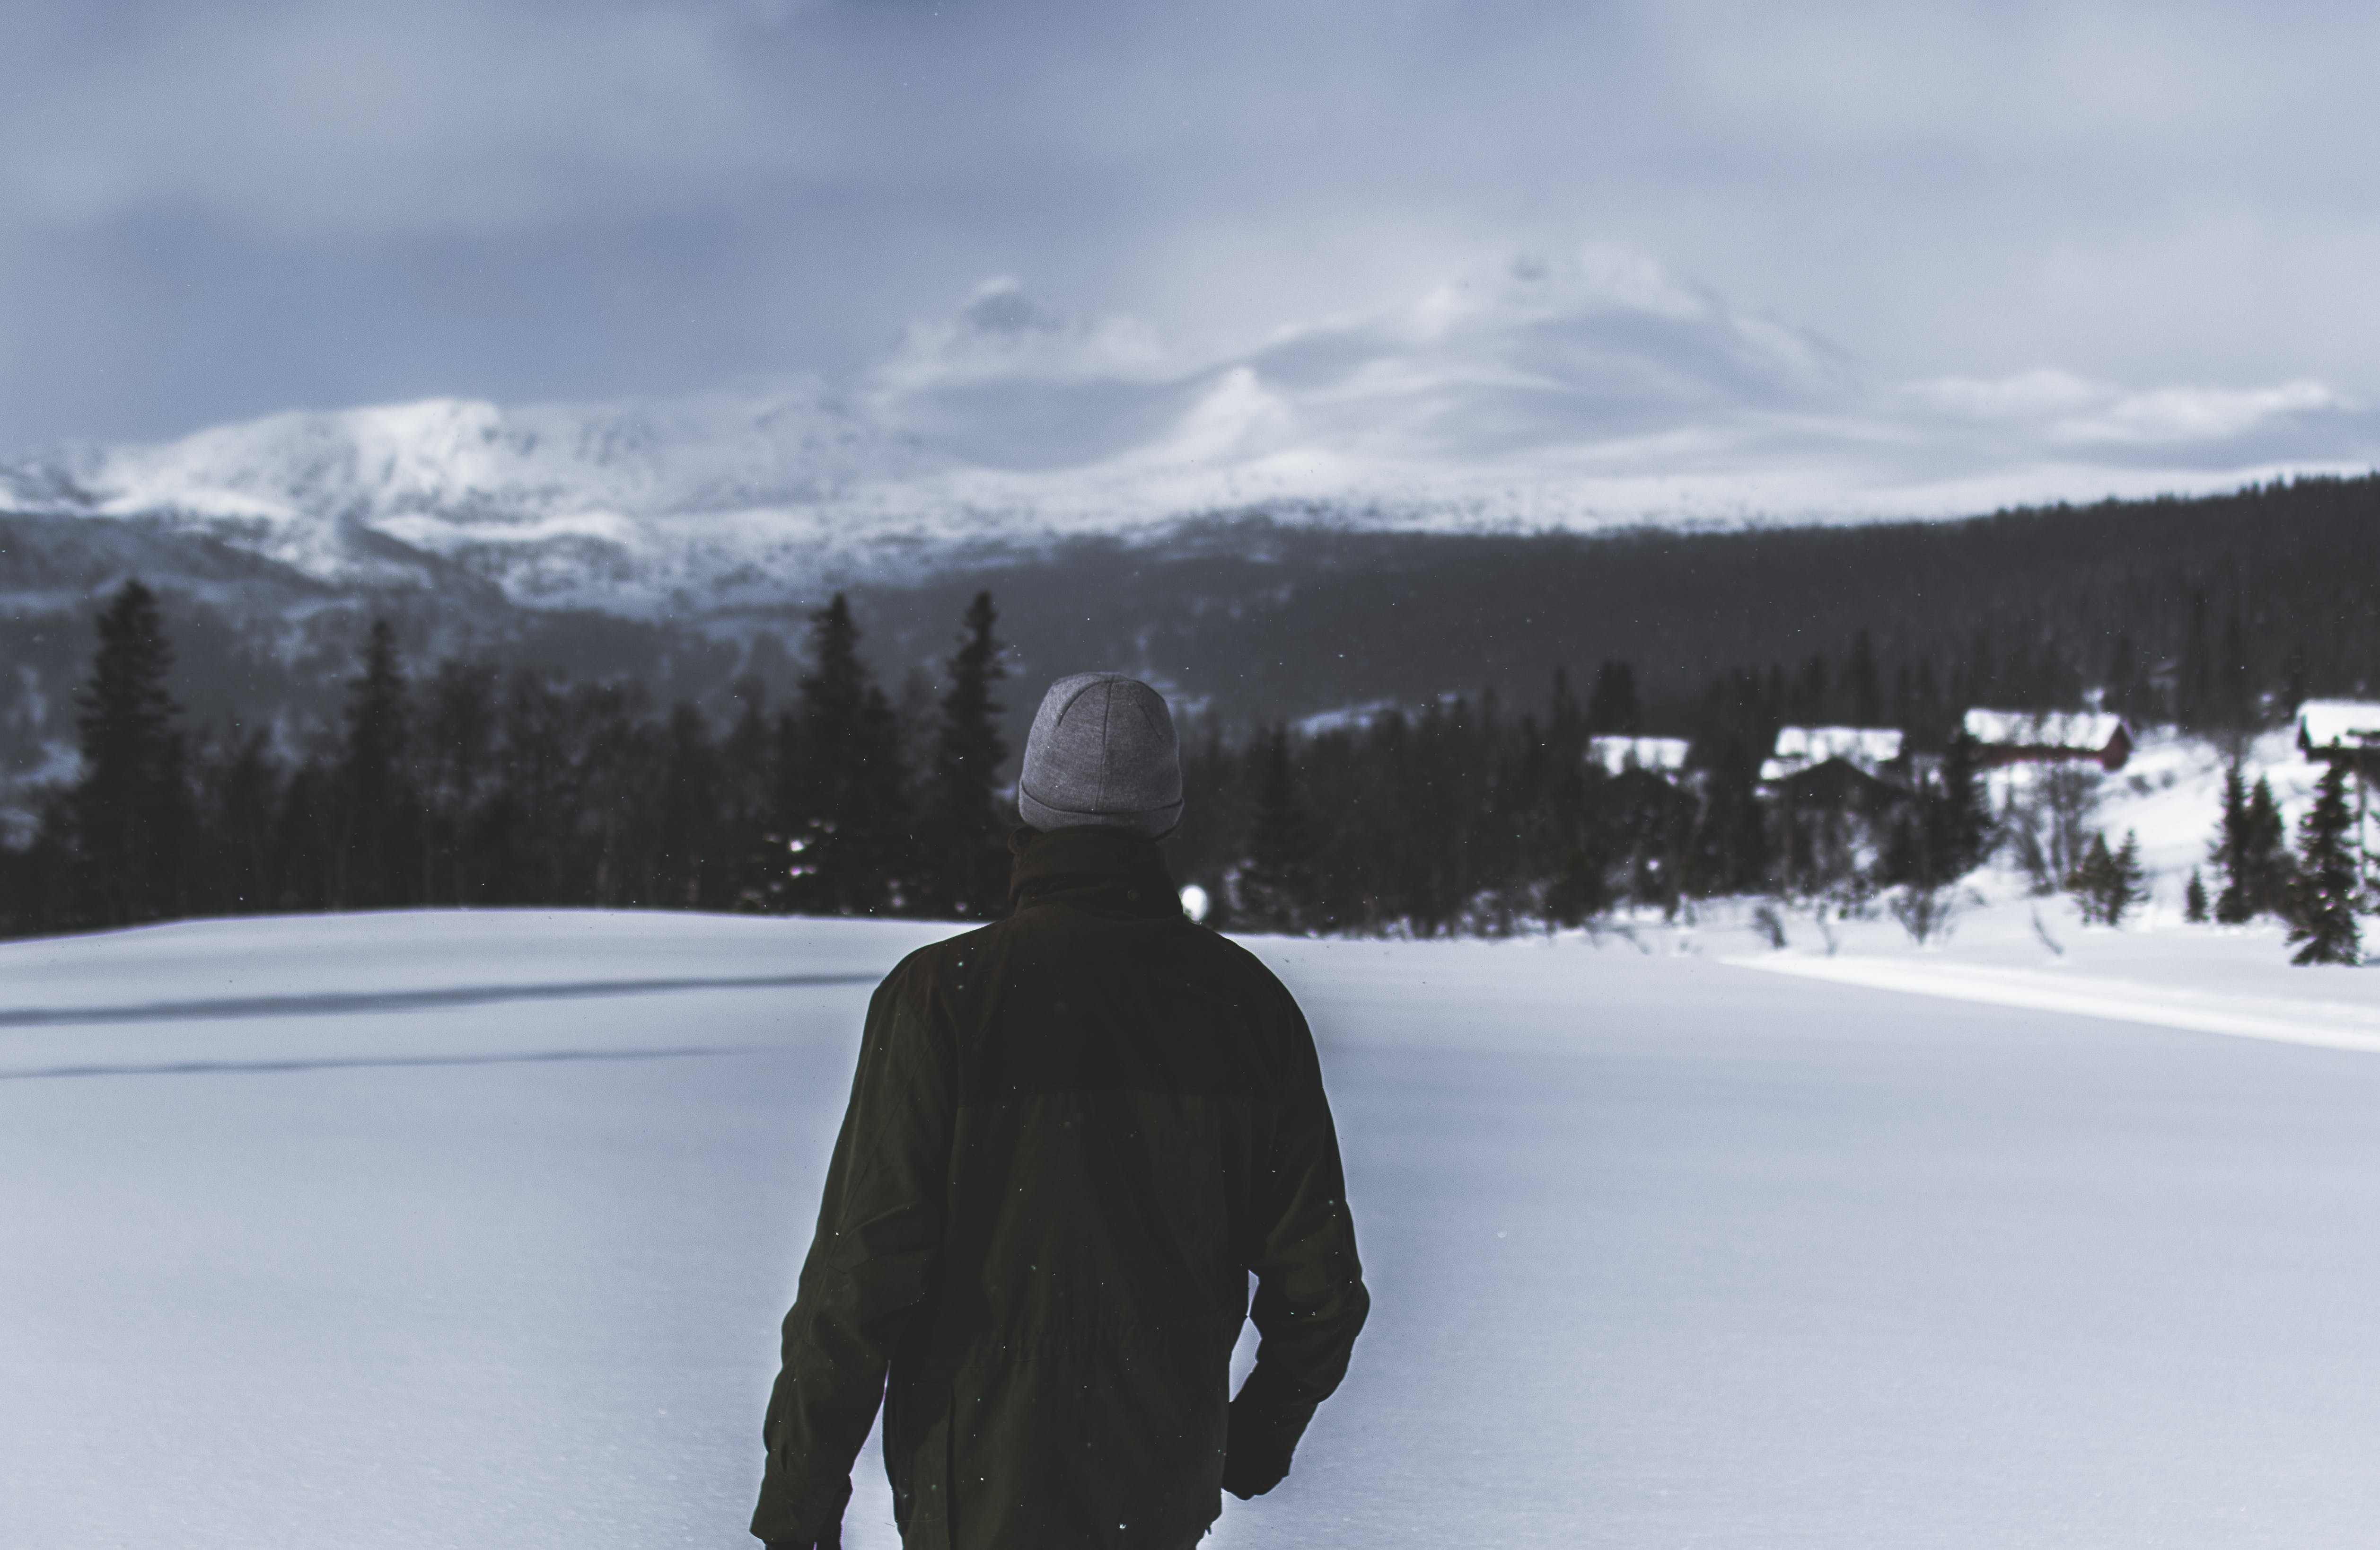 Kostenloses Stock Foto zu abhang, bäume, berge, einfrieren